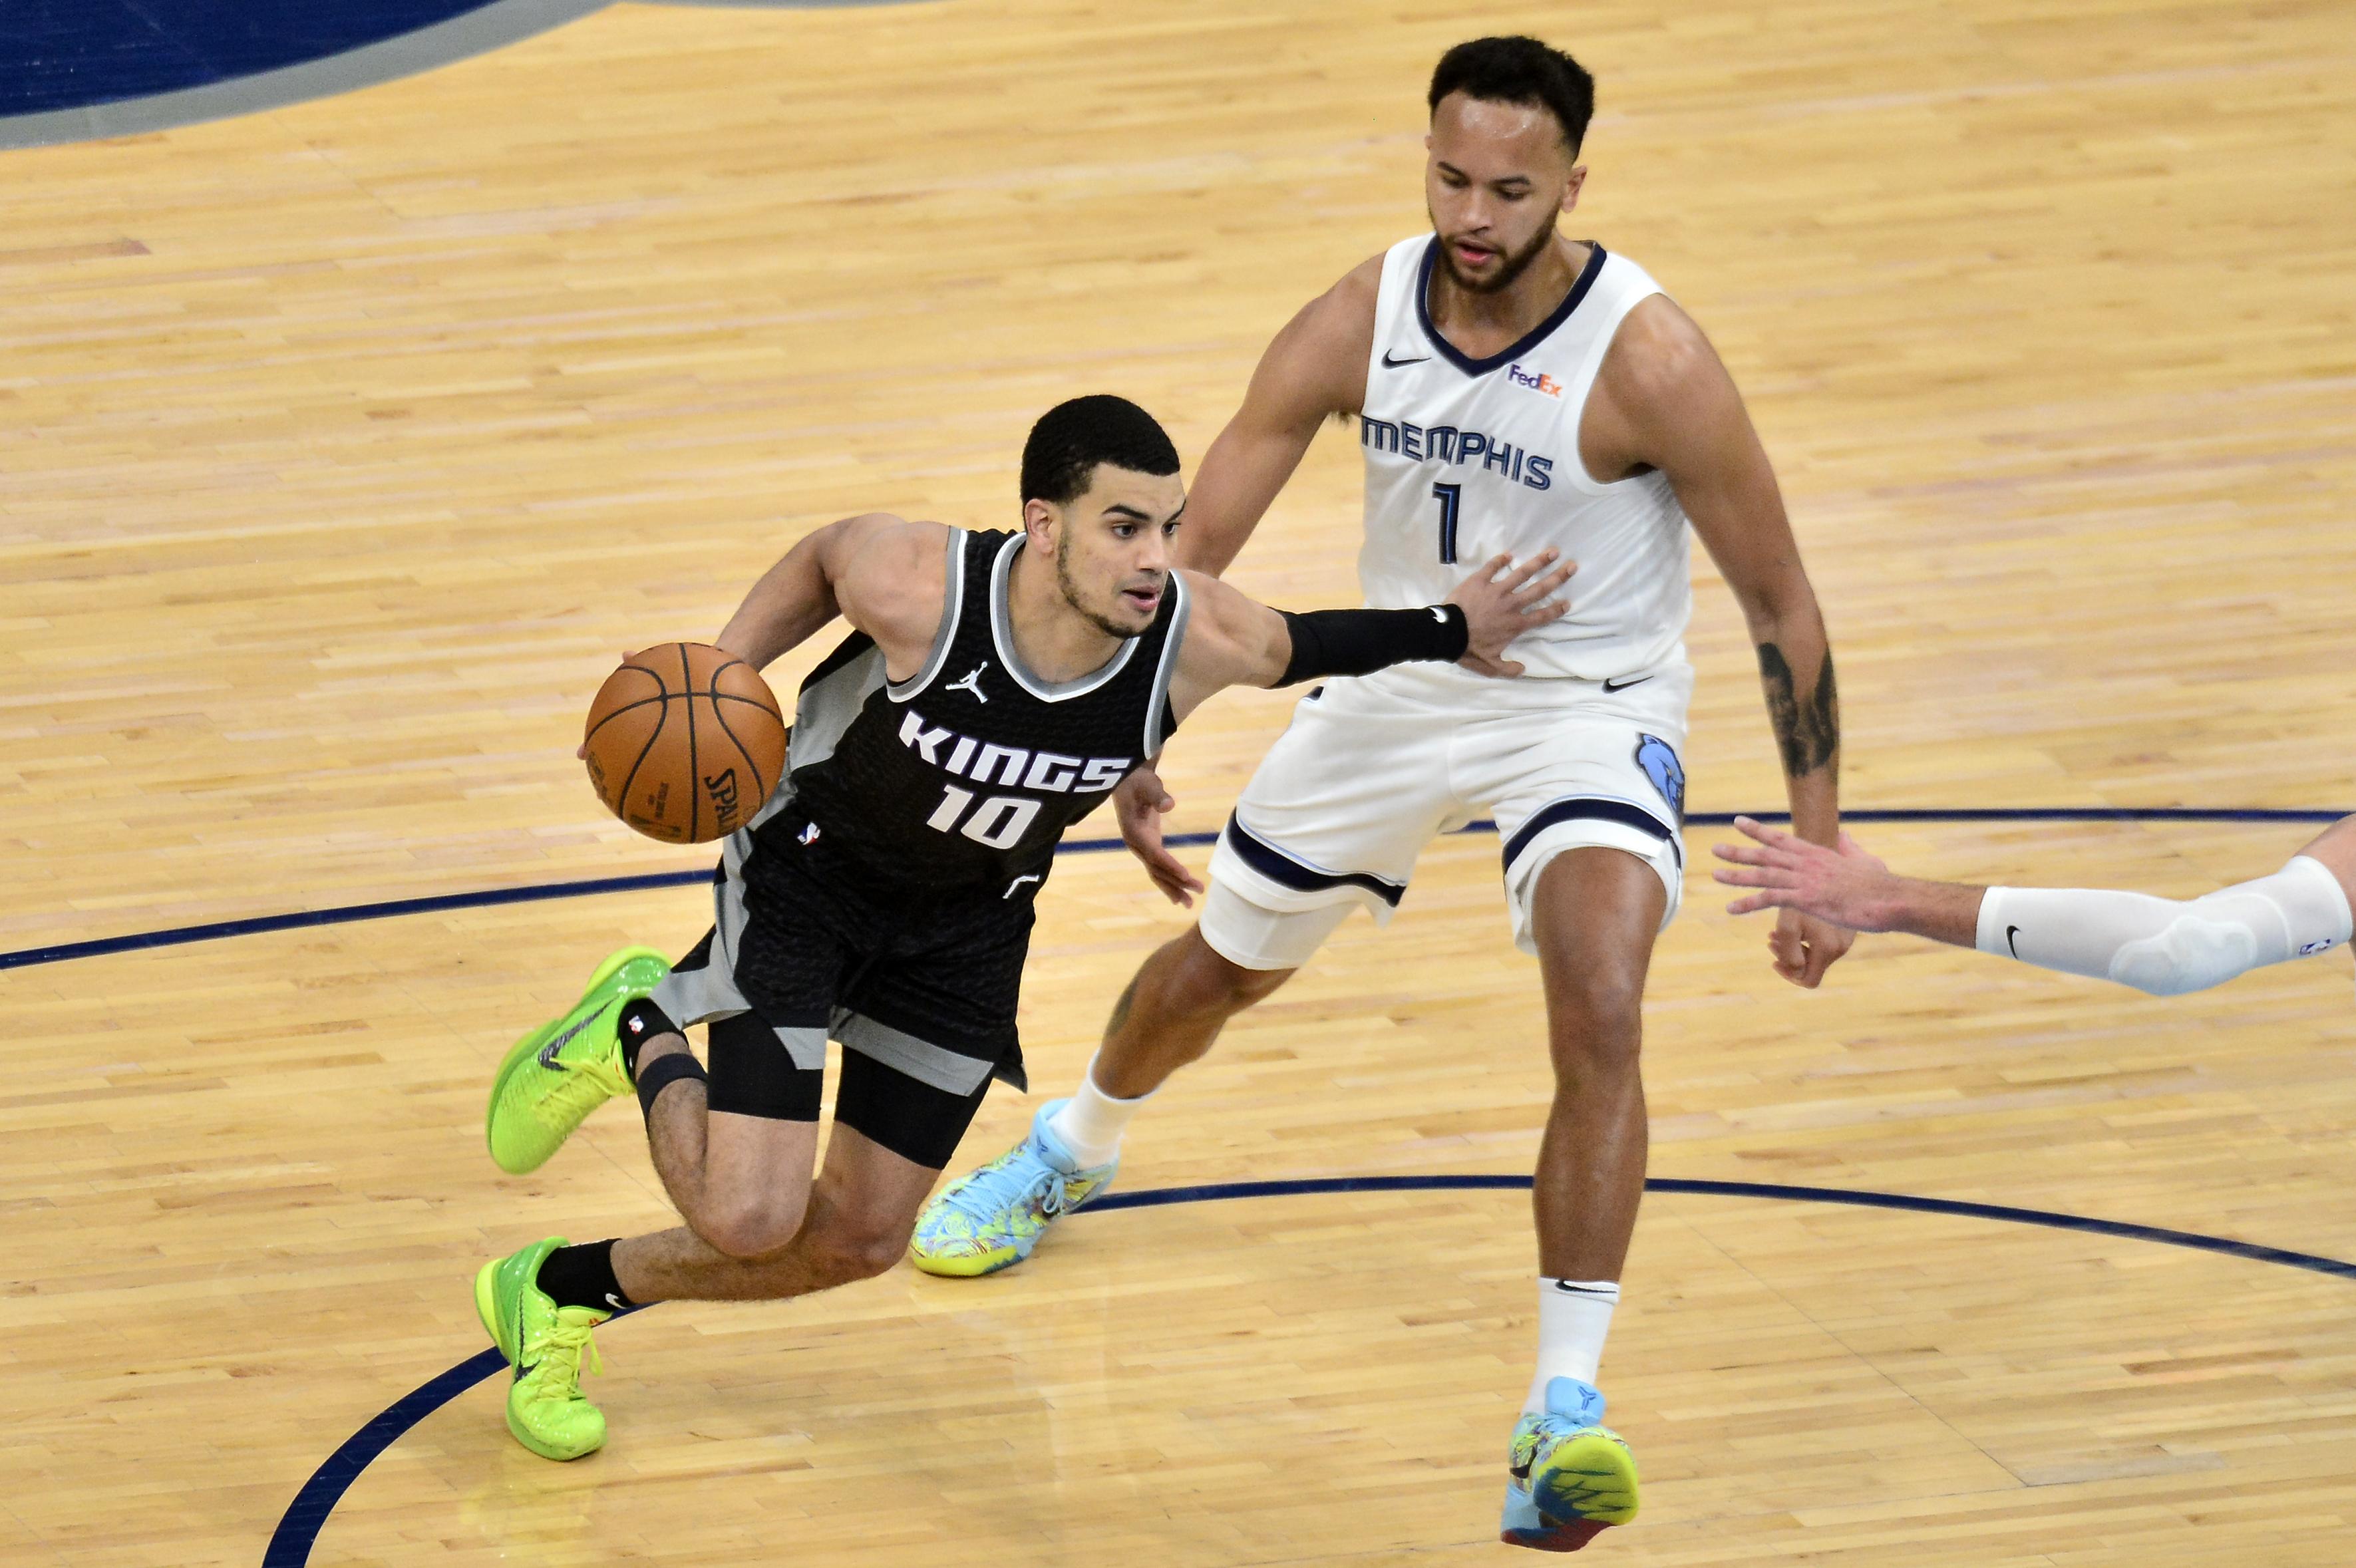 Sacramento Kings guard Justin James, wearing black, drives against Memphis Grizzlies forward Kyle Anderson